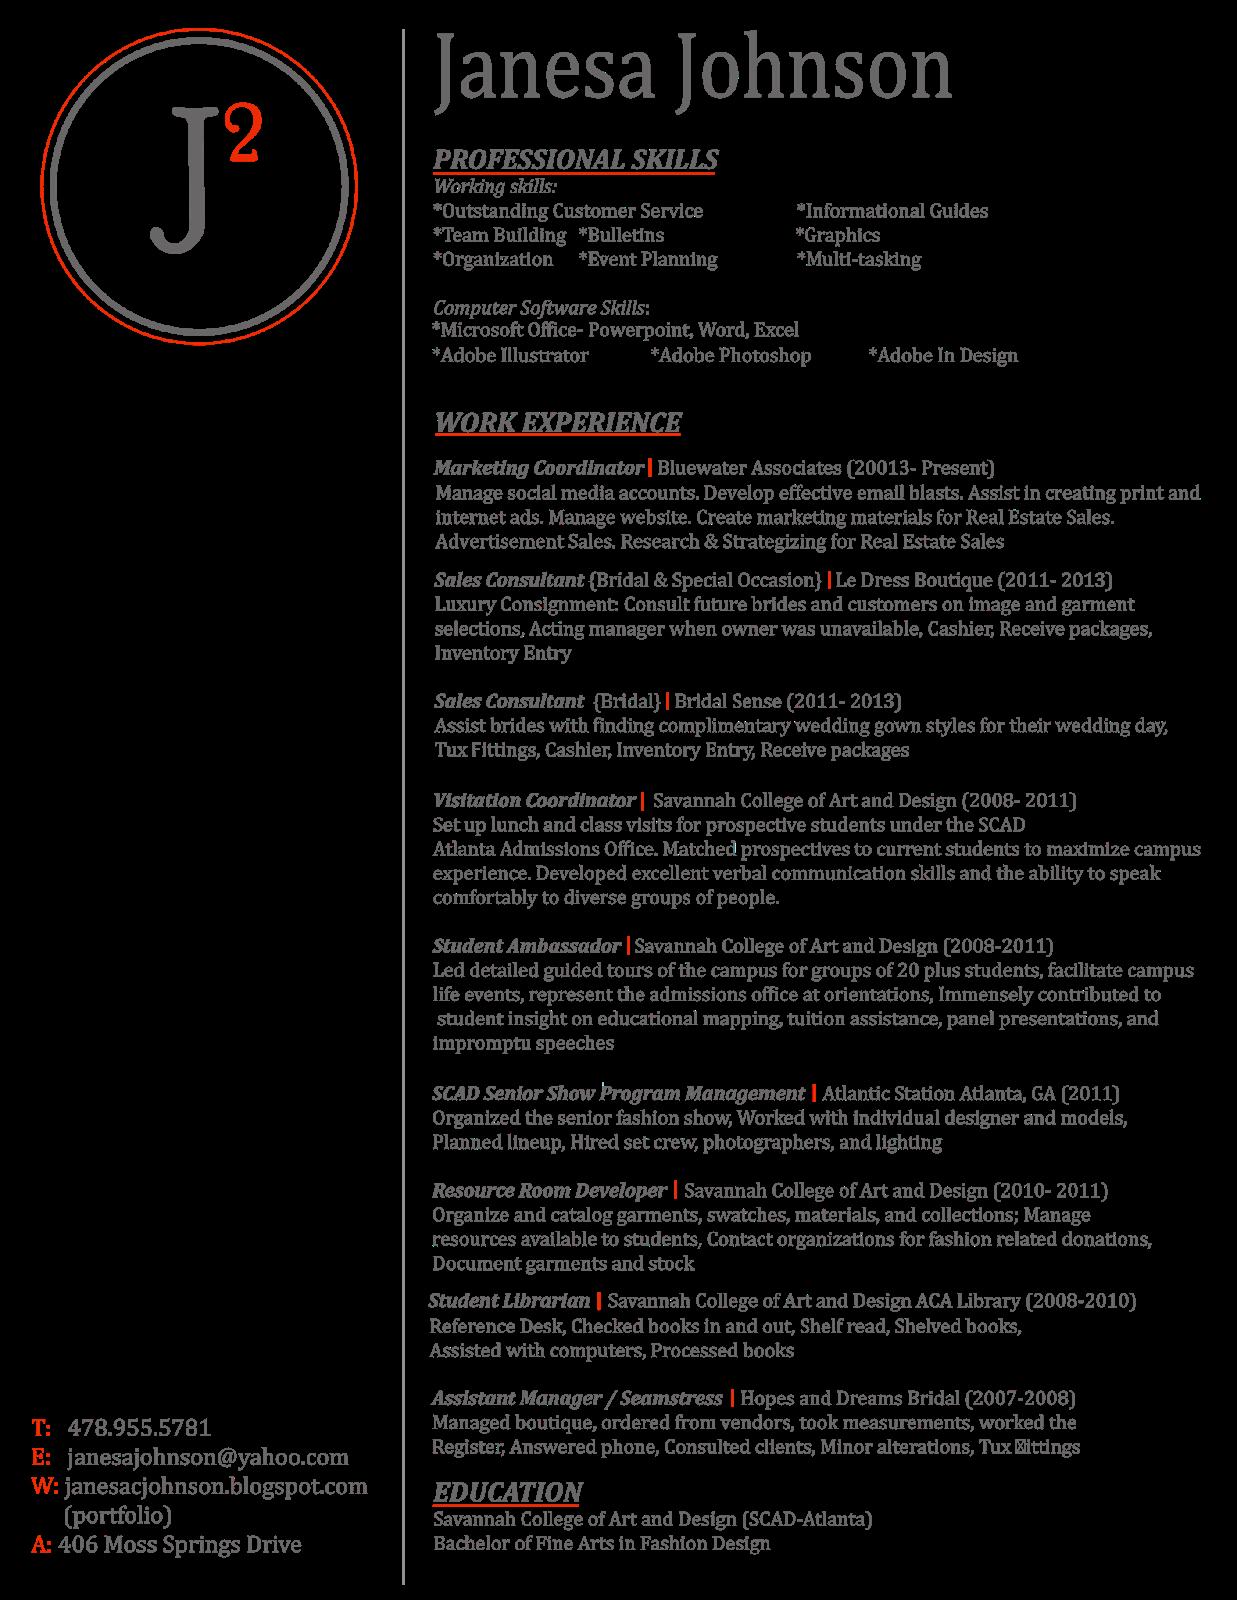 editable corporate resume 2014 png - Seamstress Resume